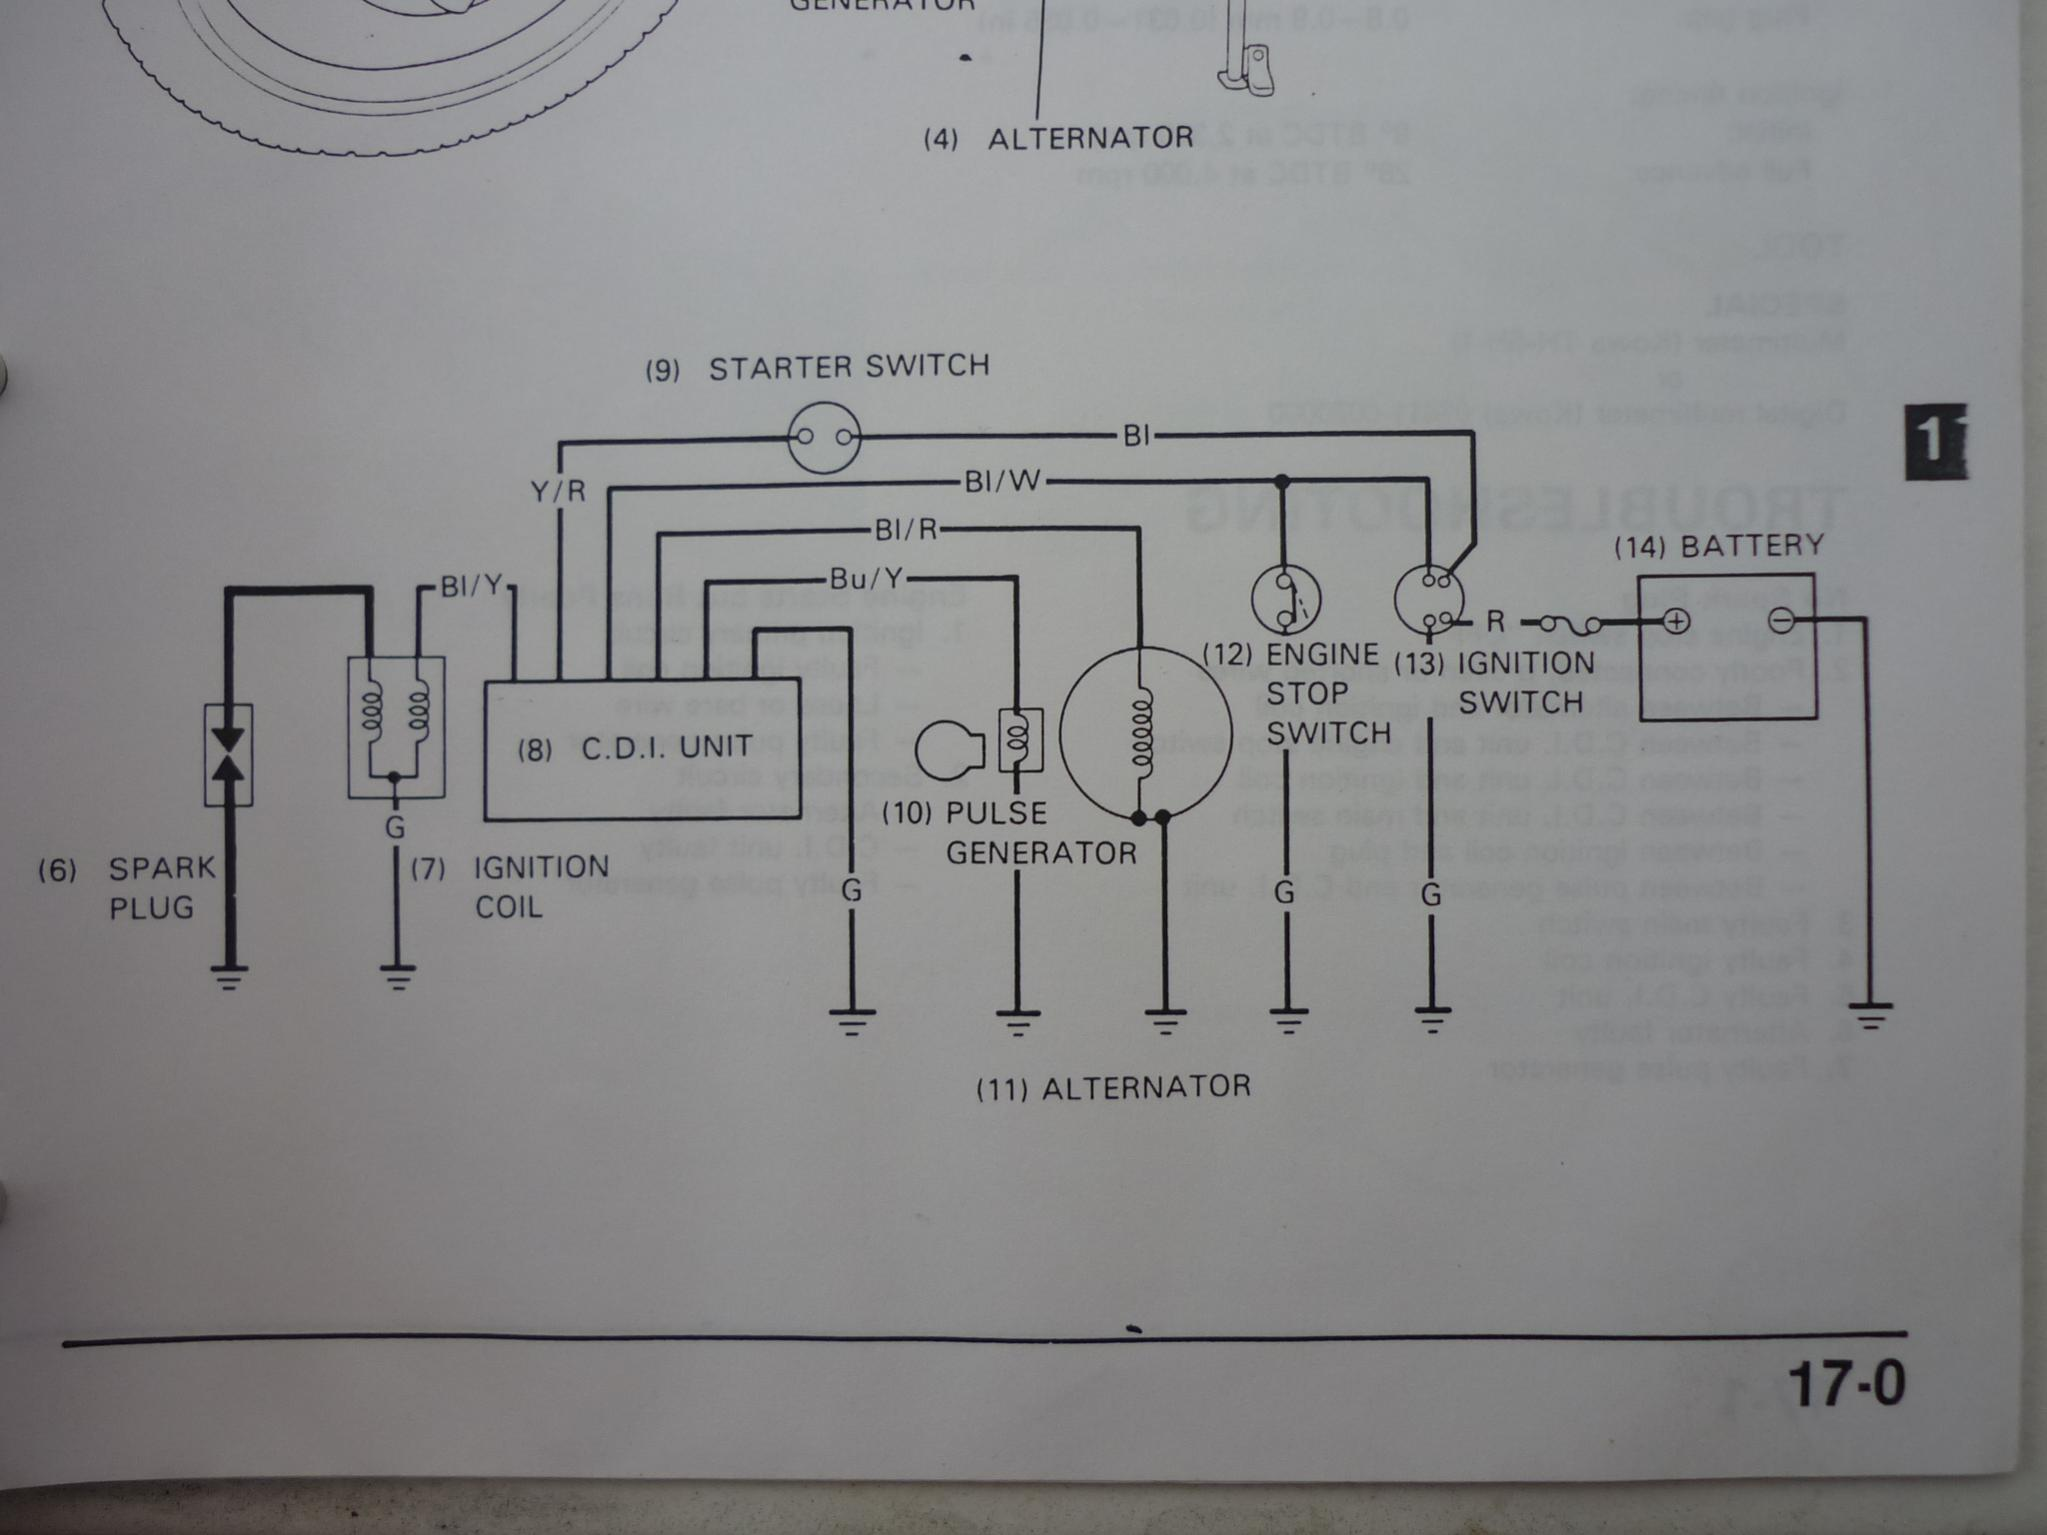 1987 Honda Xl600r Wiring Diagram 32 Images 87 18547d1339177014 Xl600 Lmf P1010573 Diagrams Instruction